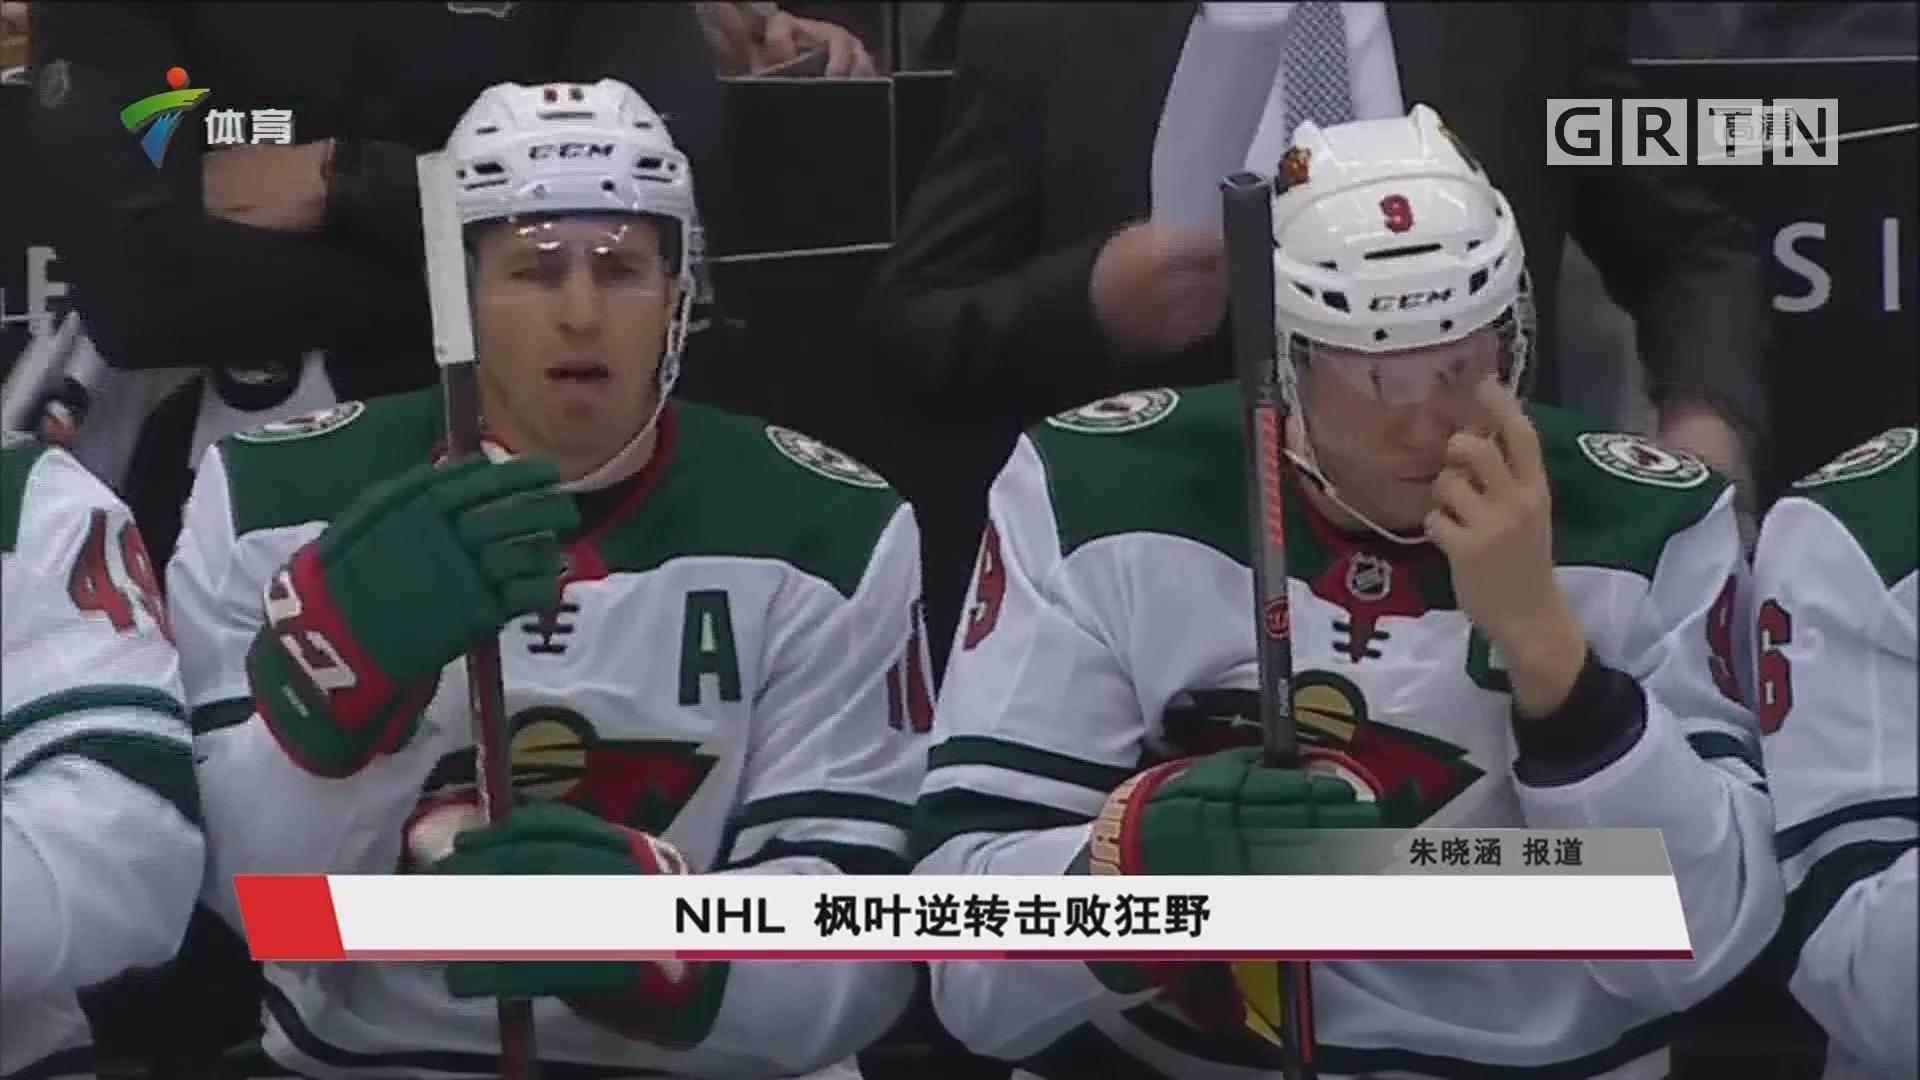 NHL 枫叶逆转击败狂野